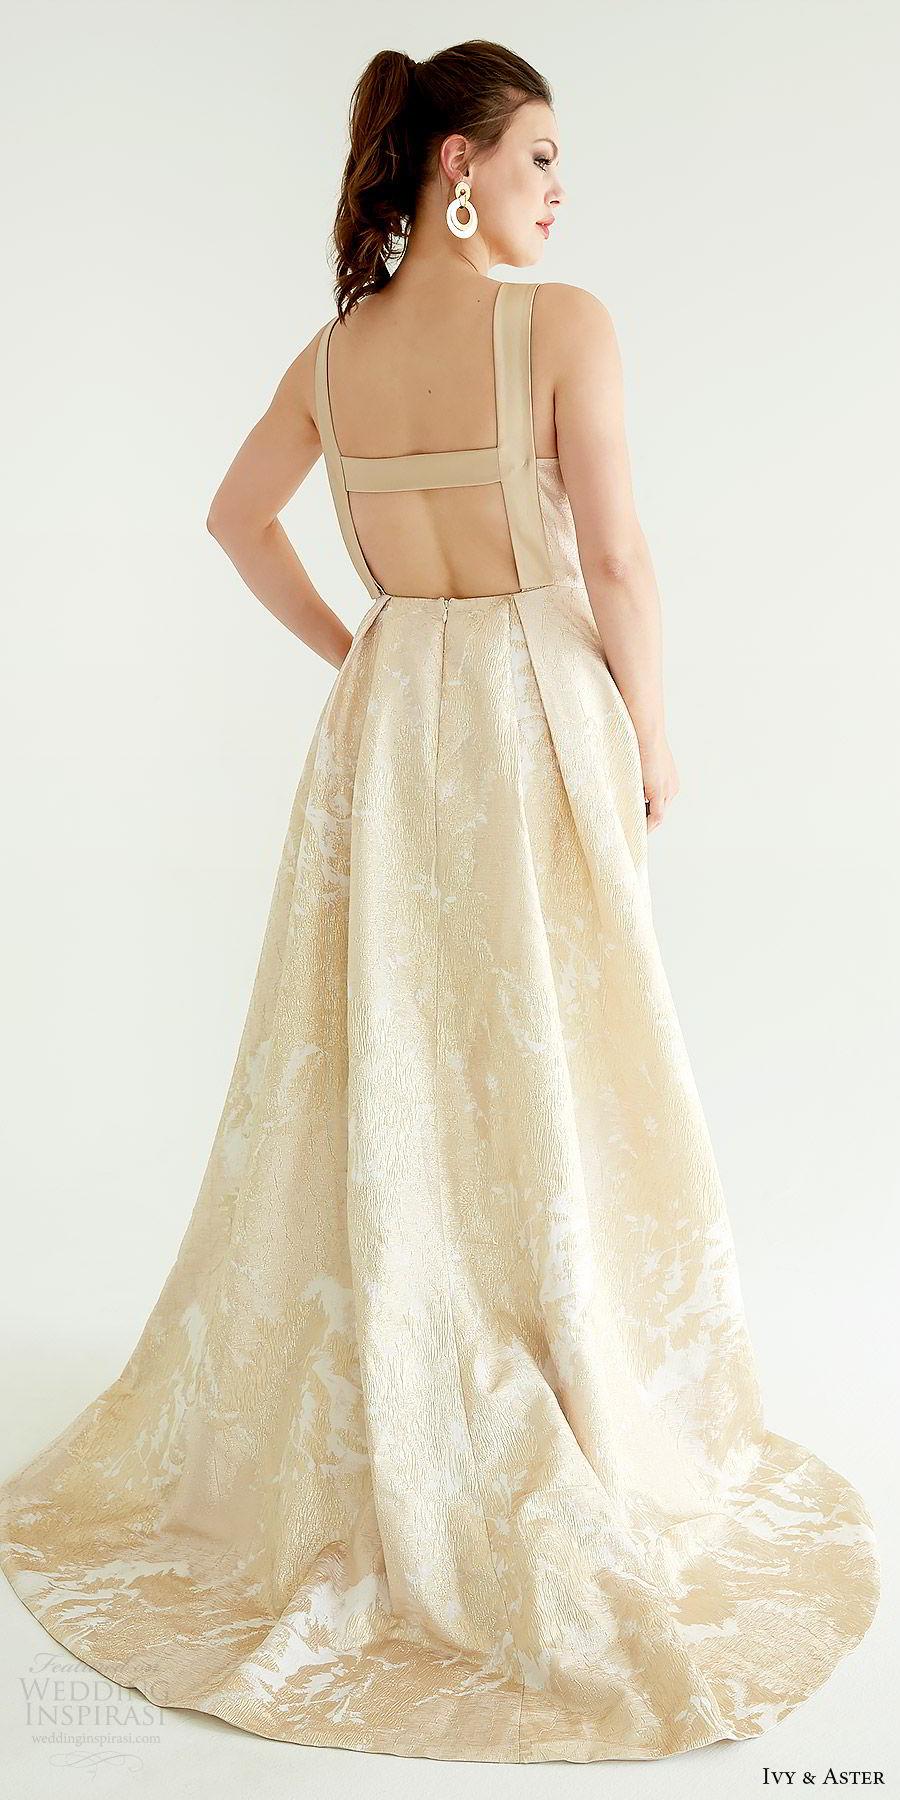 ivy aster bridal 2019 sleeveless straps jewel neck lace a line ball gown skirt wedding dress (delevigne) bv sweep train elegant gold color pockets